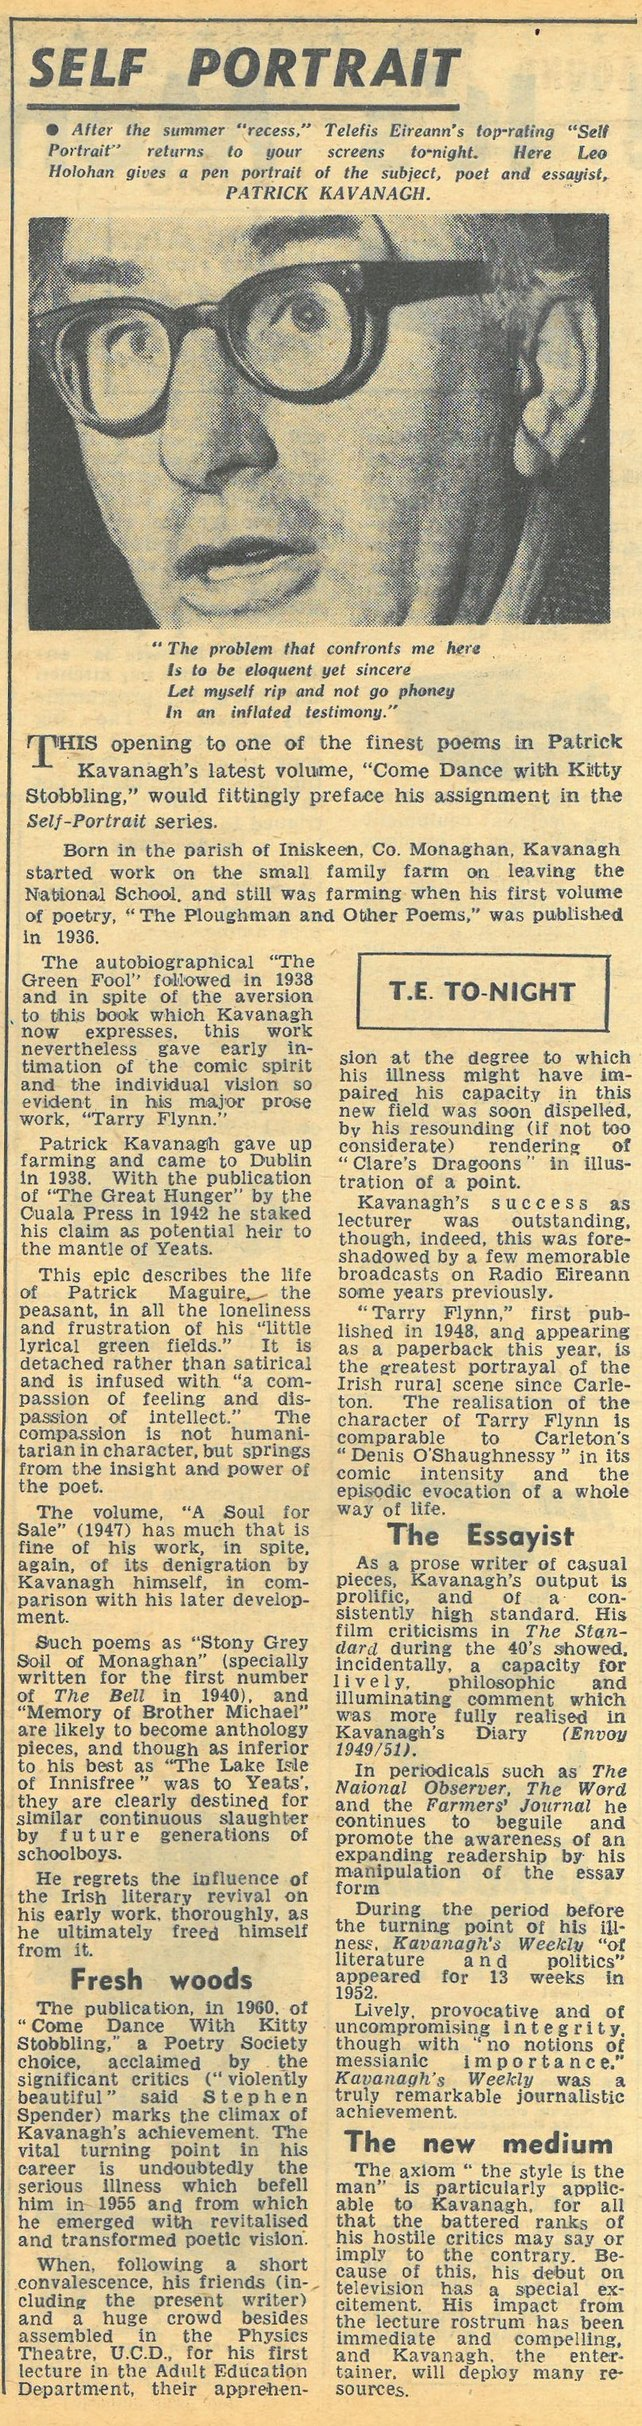 RTÉ Guide, Patrick Kavanagh 30 October 1962